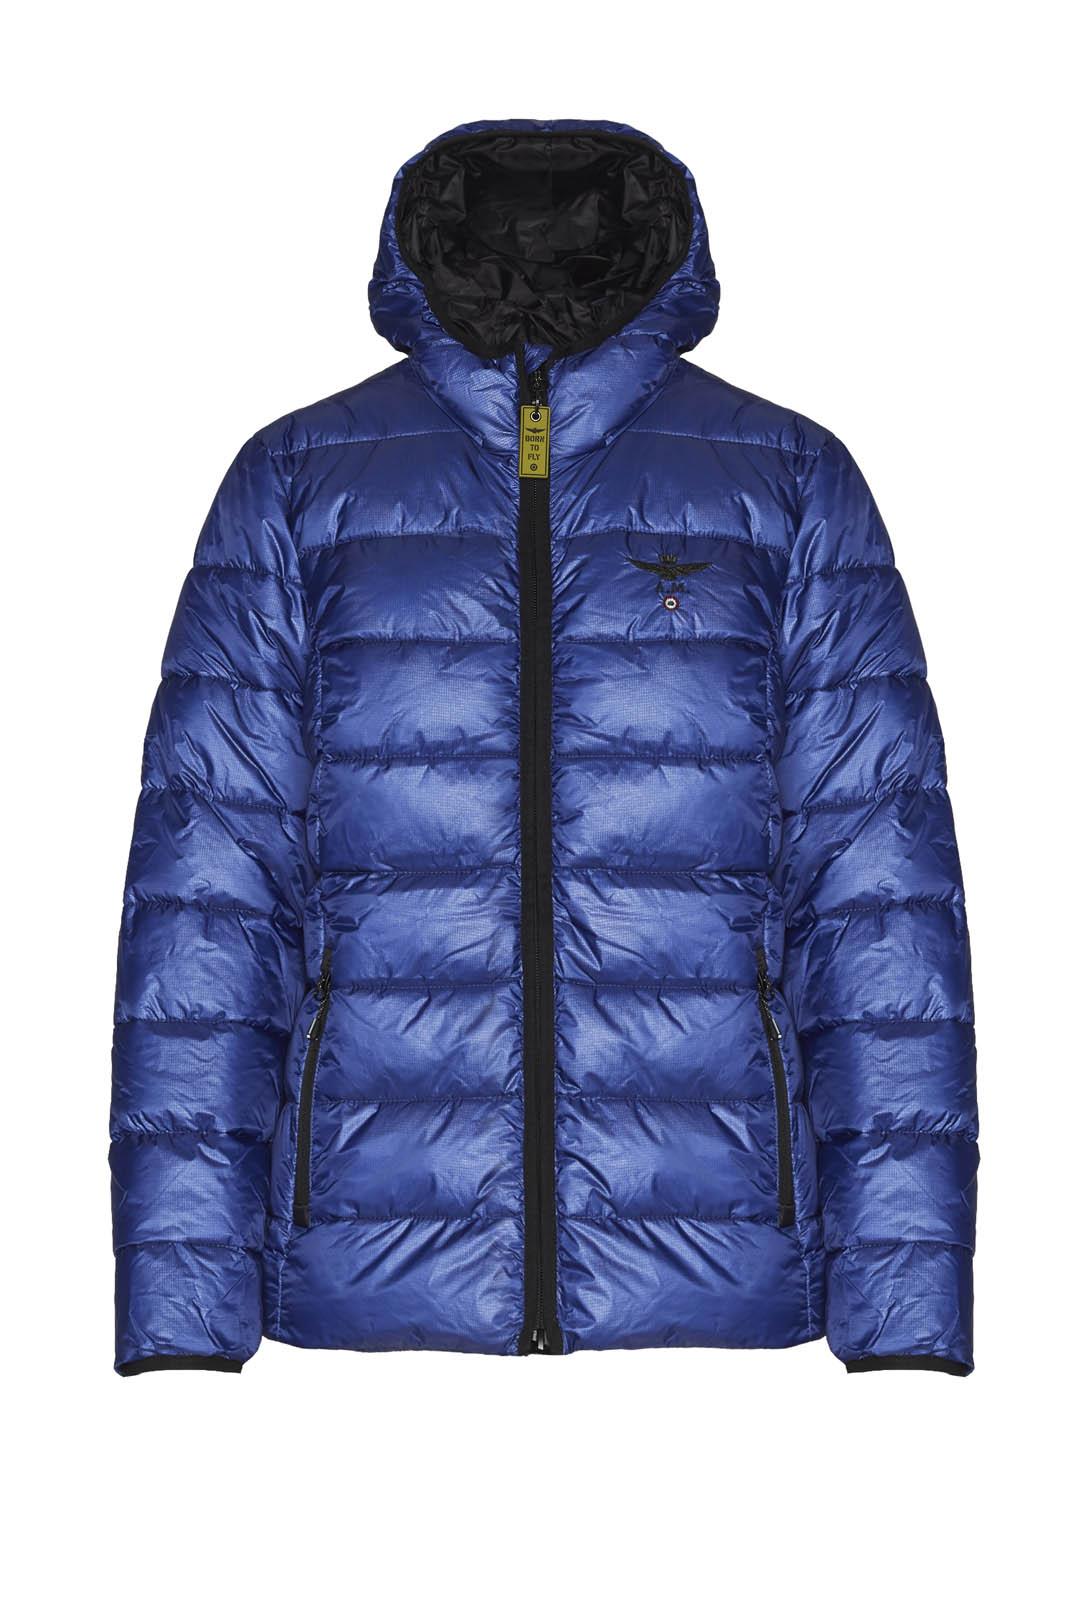 Padded jacket with hood                  1